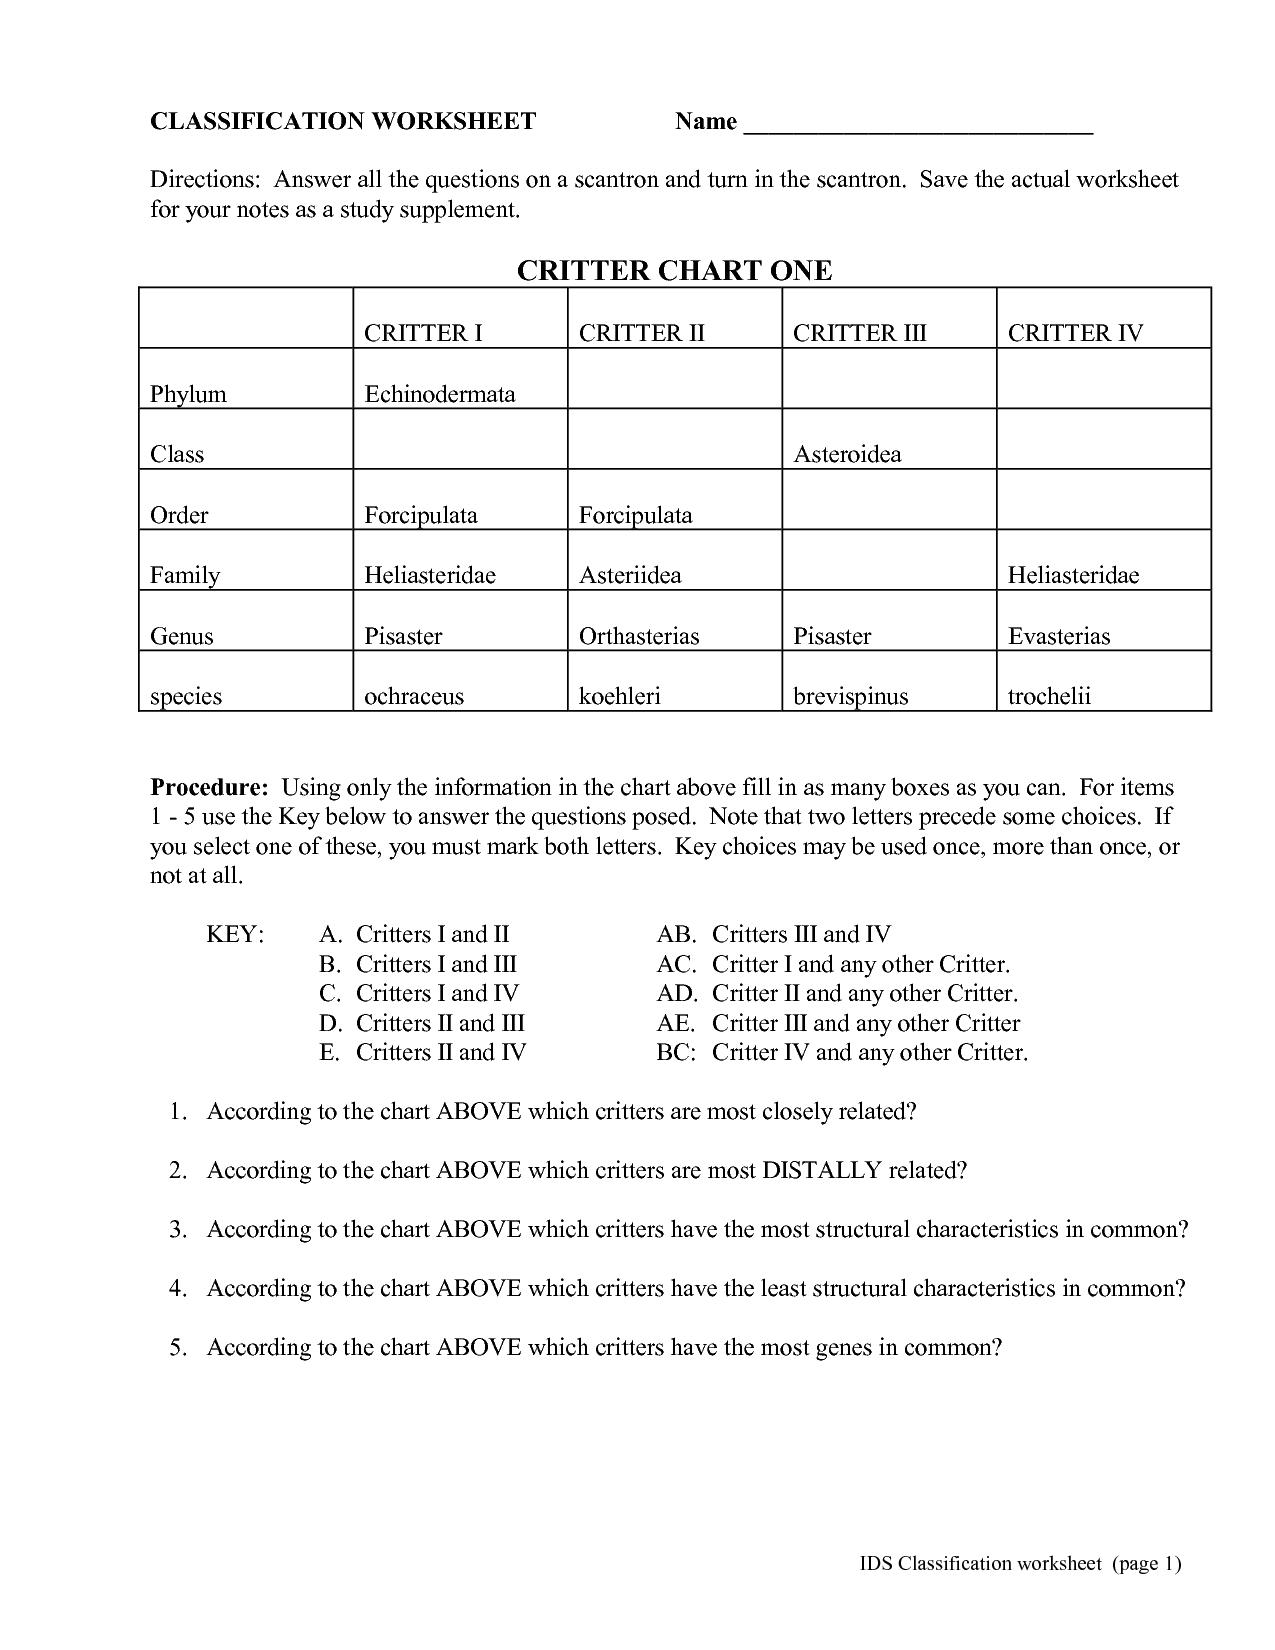 Taxonomy Classification Worksheet